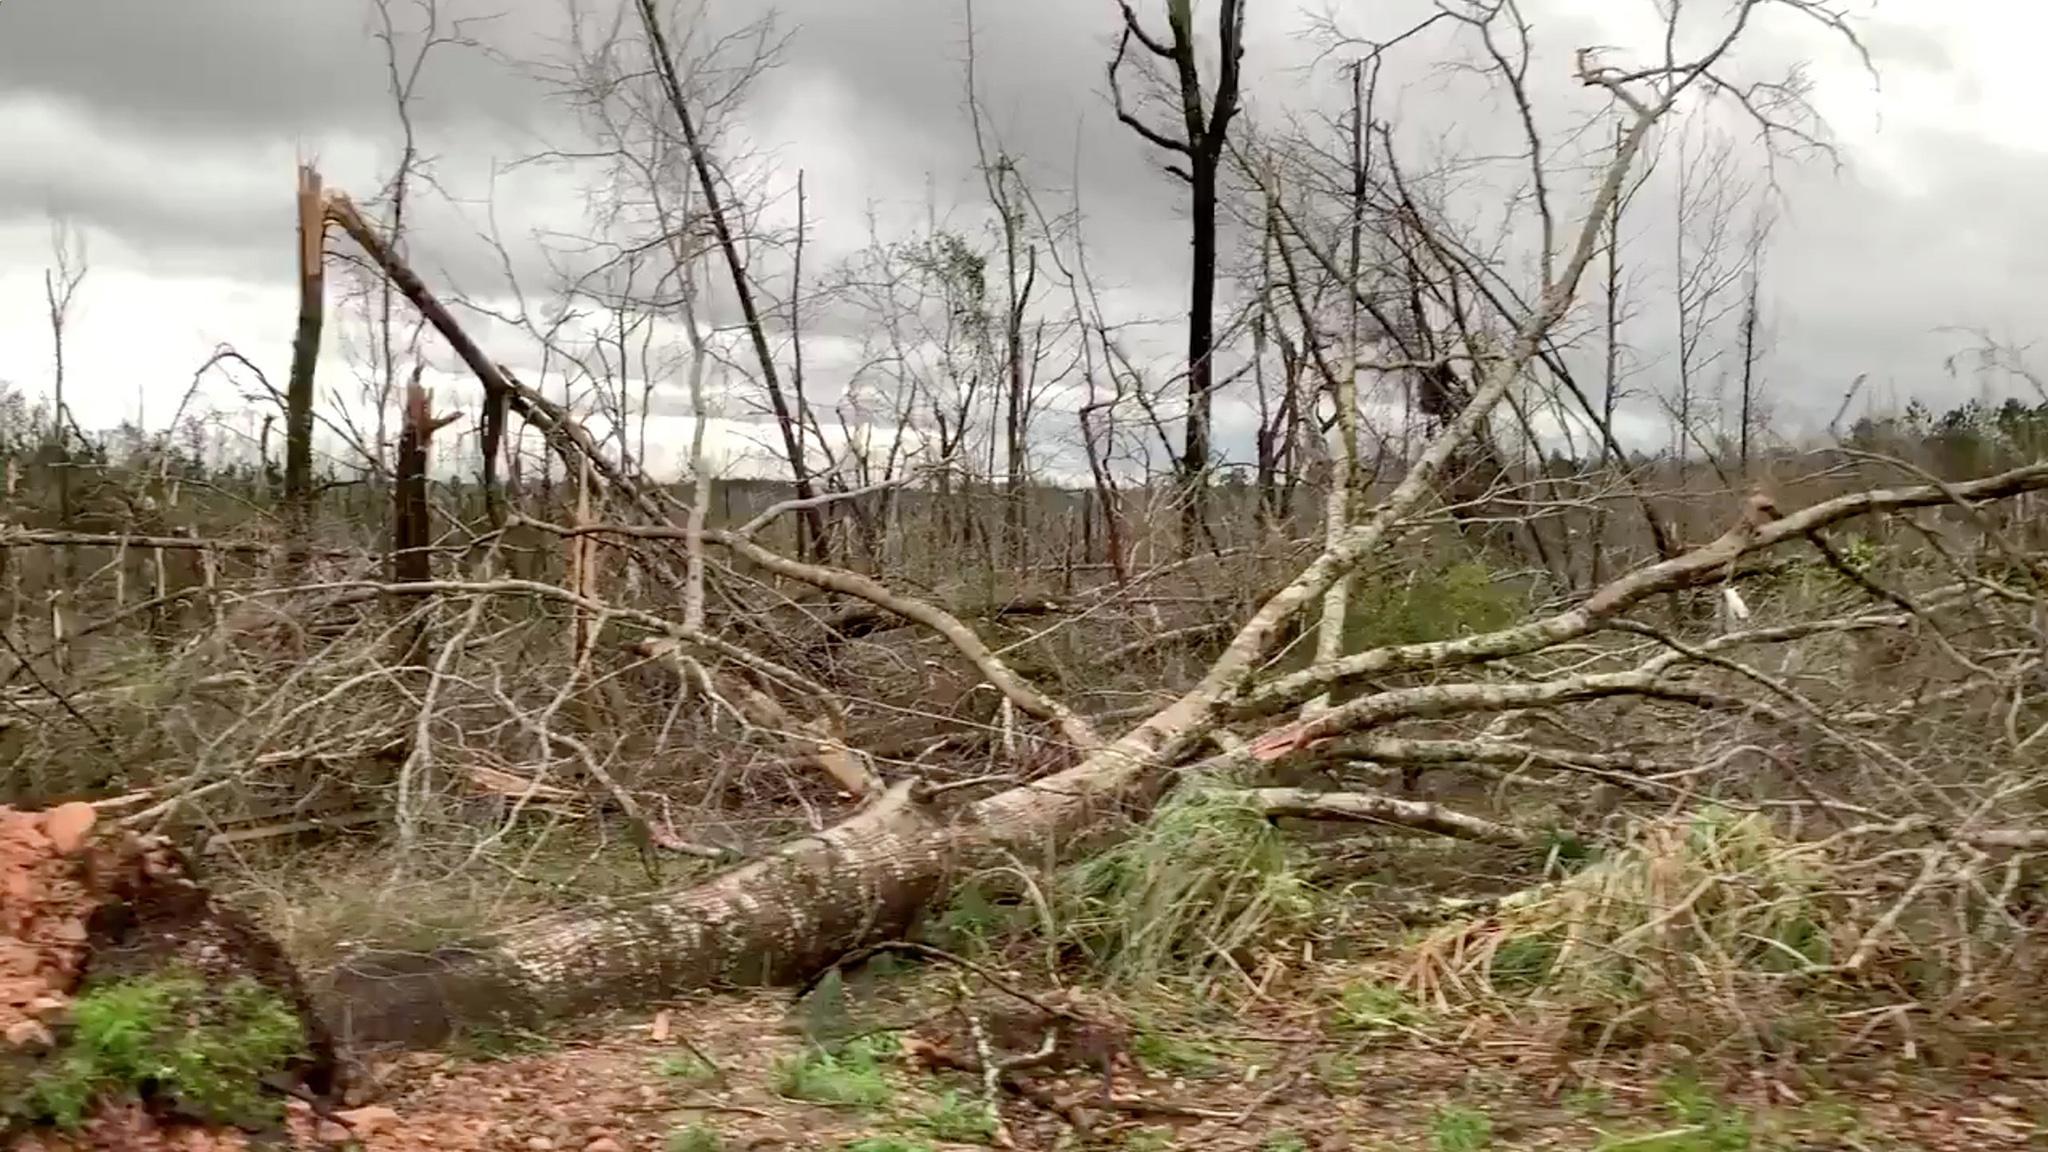 424b17cae49 Kentucky tornado  Children miraculously survive after twister rips apart  church